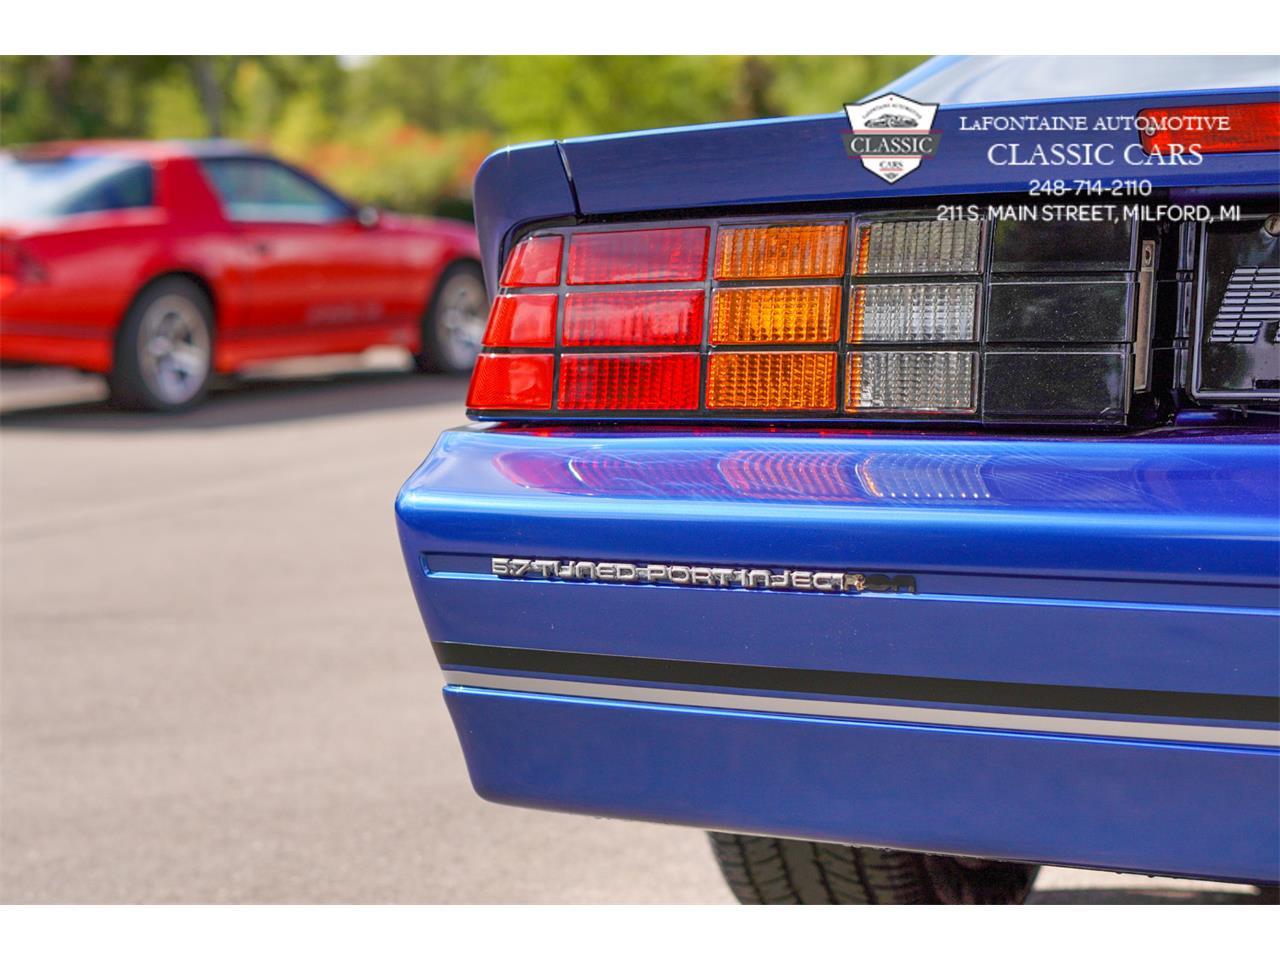 1989 Chevrolet Camaro IROC-Z (CC-1410015) for sale in Milford, Michigan